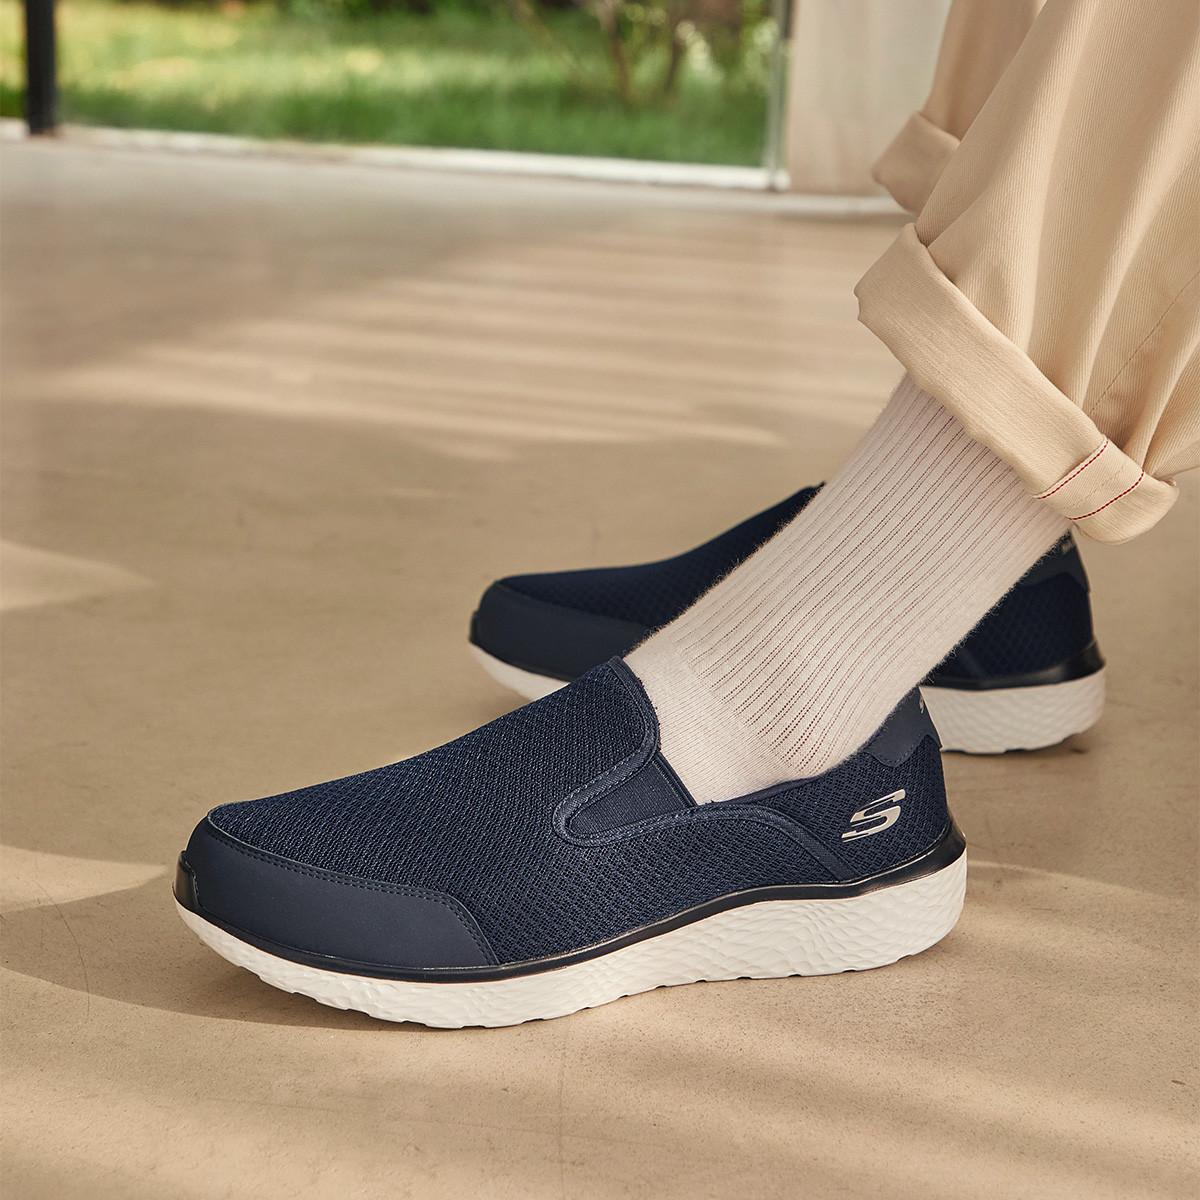 SKECHERS 斯凯奇 男士休闲鞋 59401-NVY